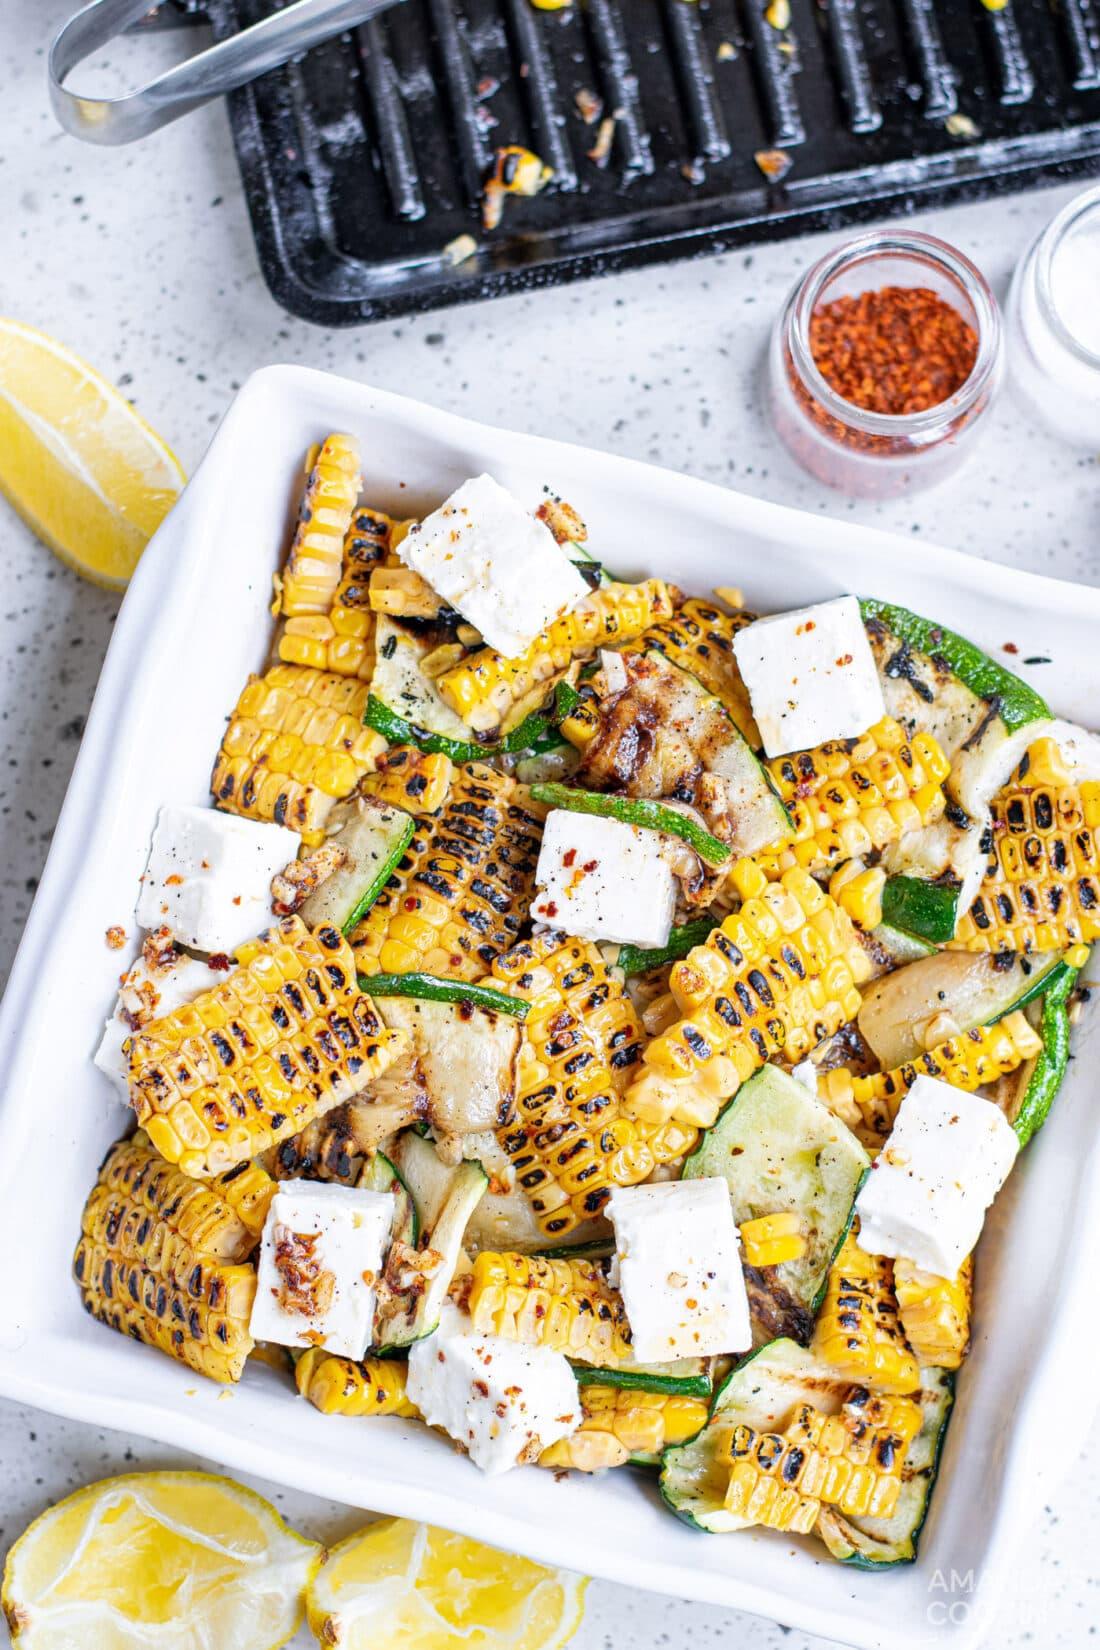 Grilled Corn & Zucchini Salad in a bowl